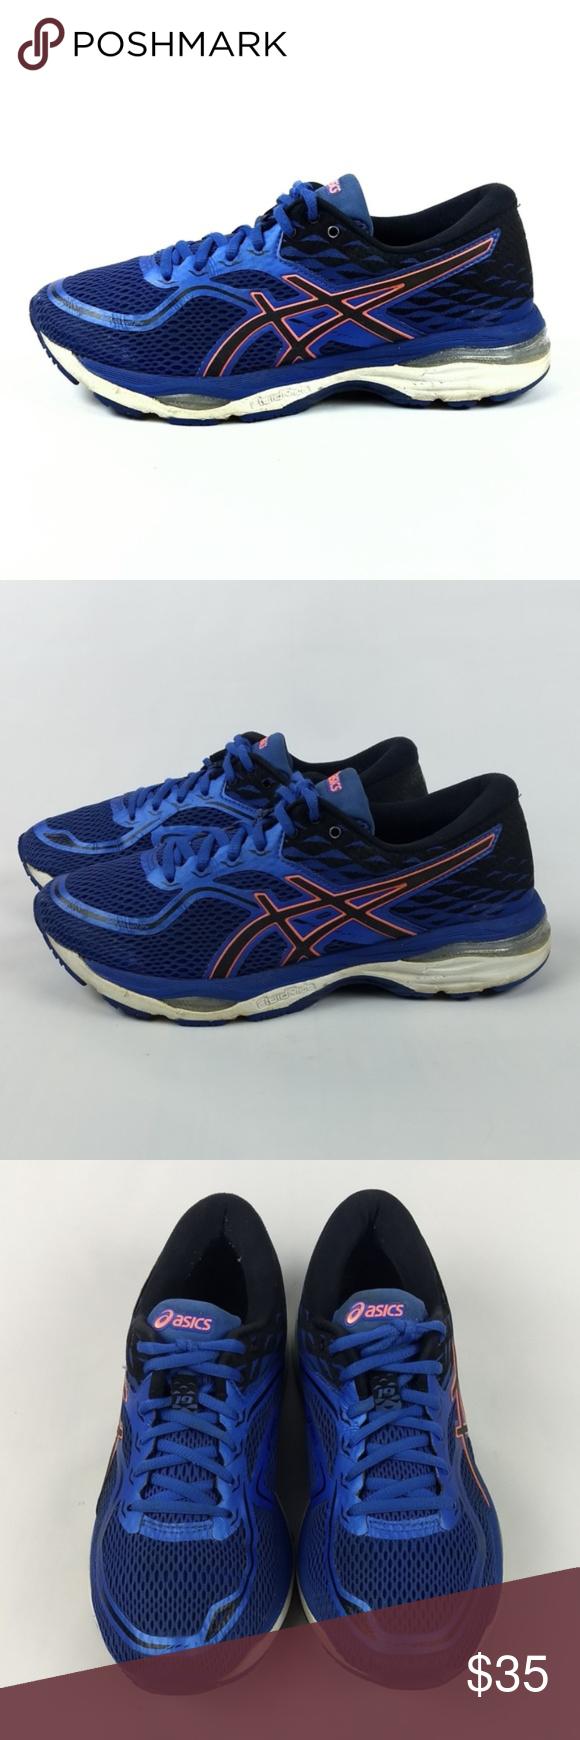 Asics Gel Cumulus 19 Running Shoes Size 8   Running shoes, Asics ...